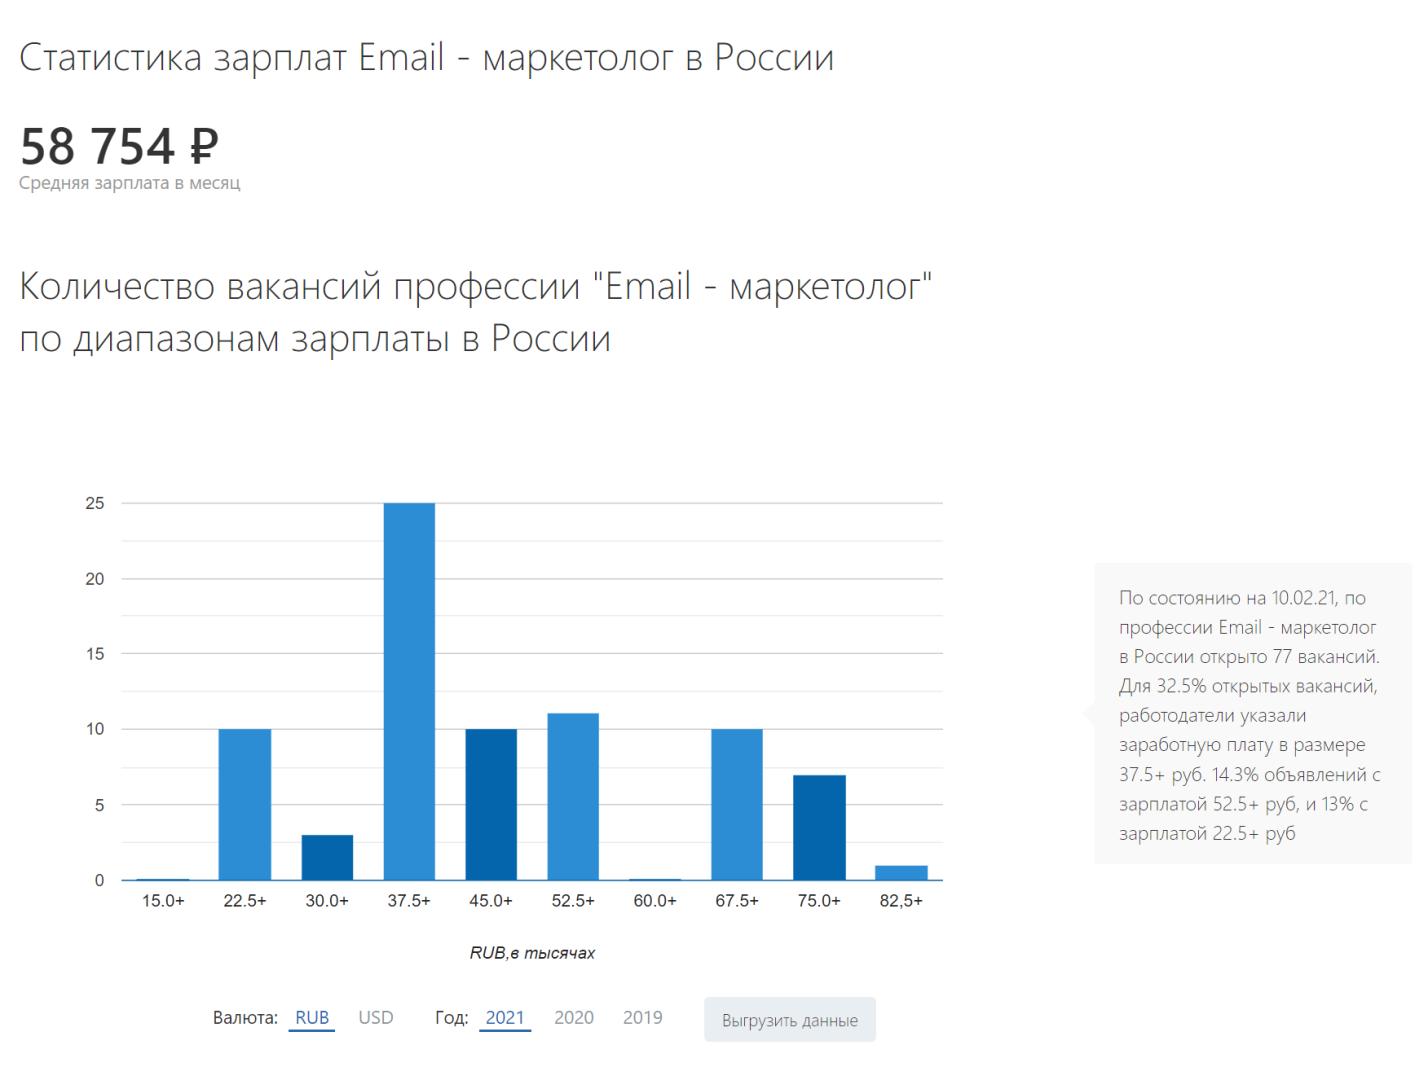 Зарплата email-маркетолога - статистика по России